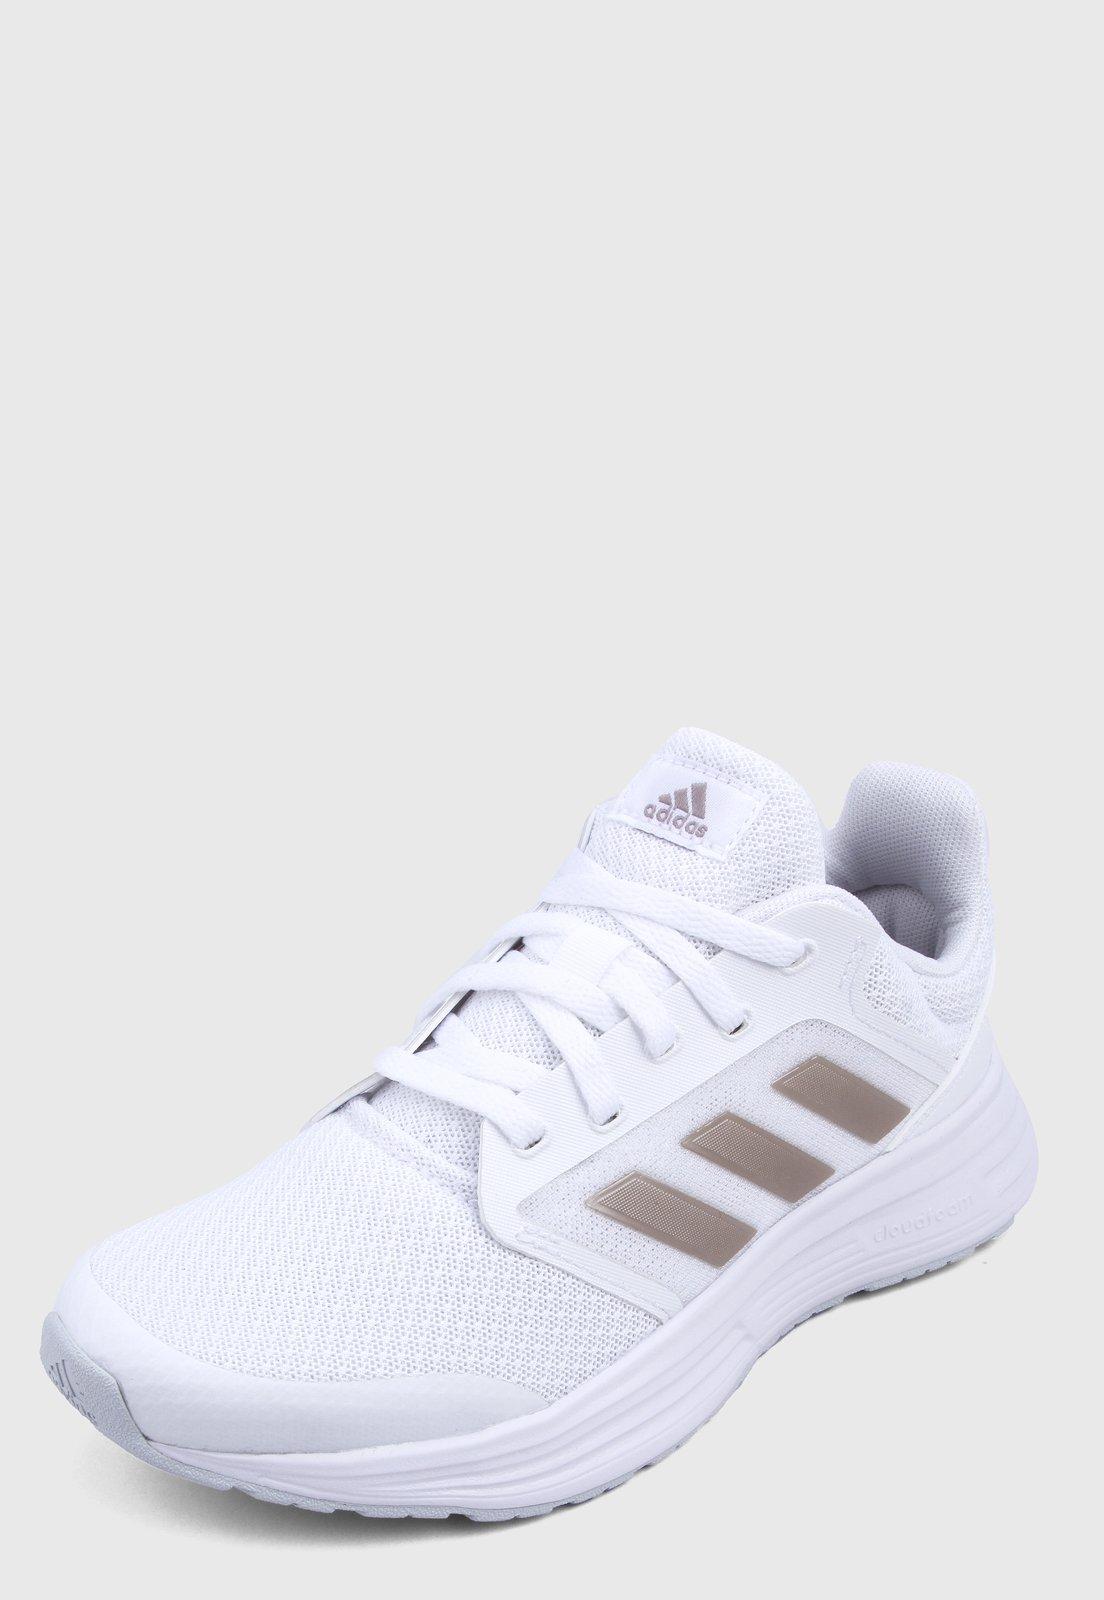 Tenis Running Blanco-Dorado adidas Performance Galaxy 5